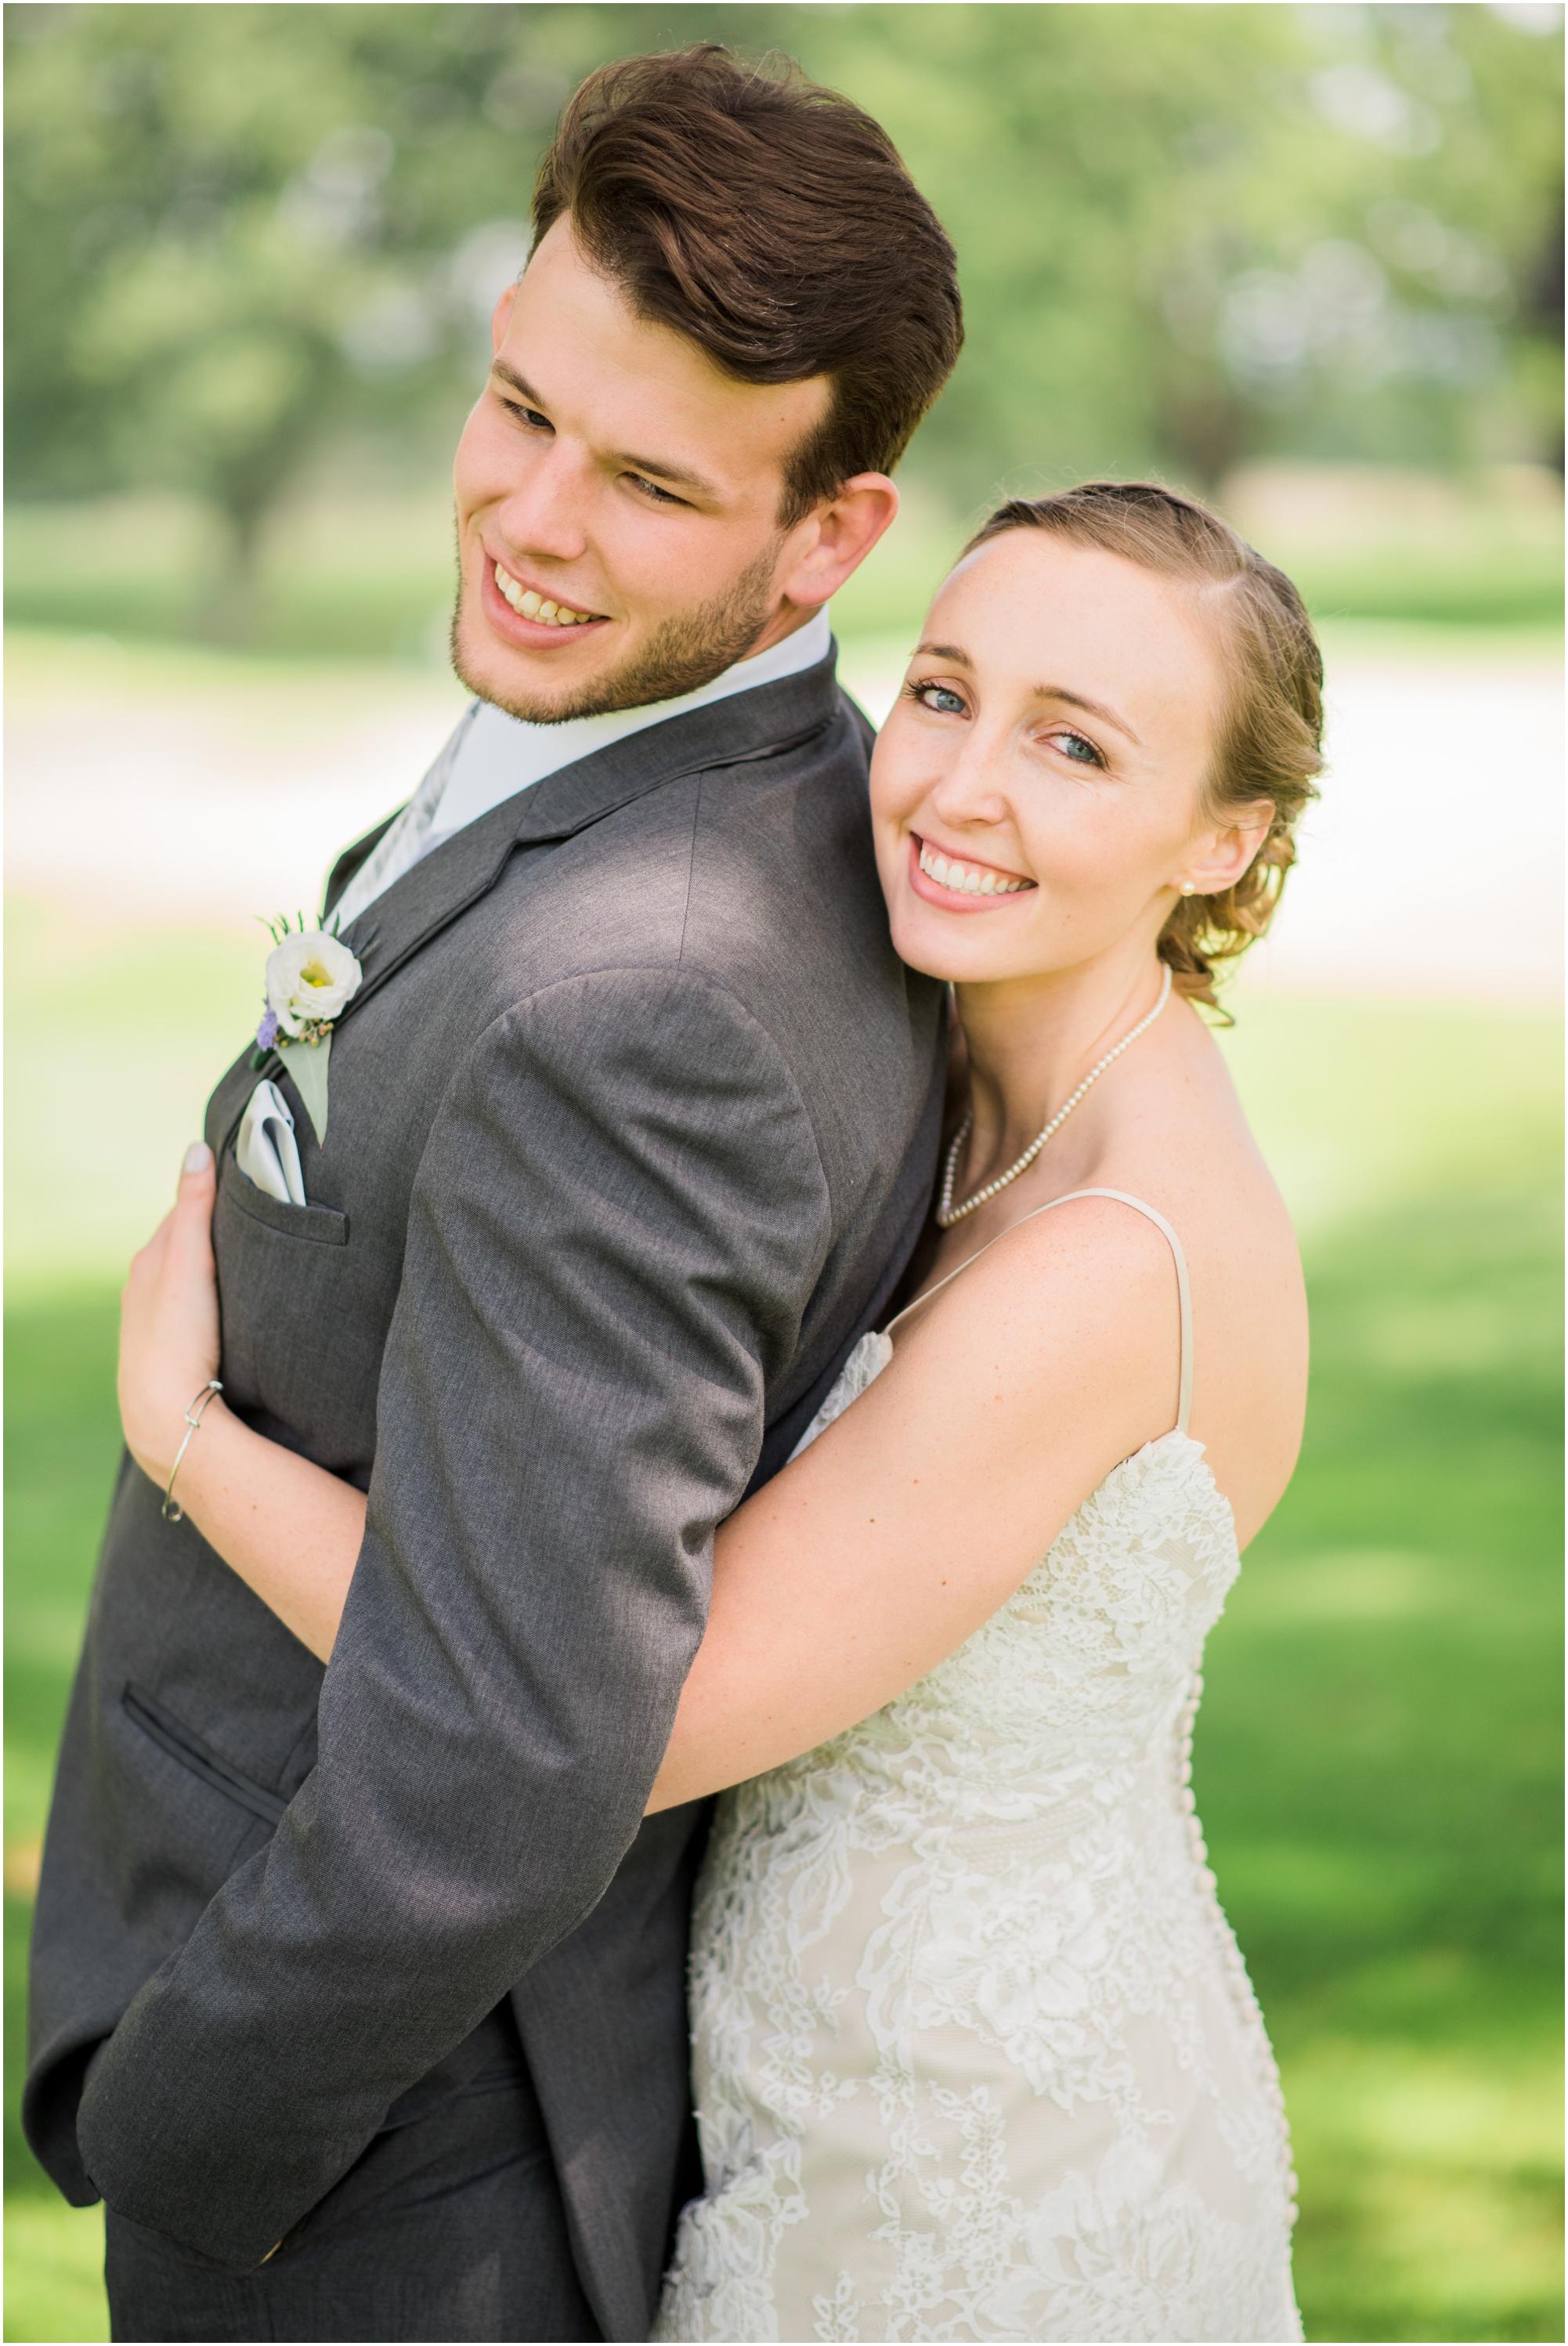 Wisconsin-Wedding-Photographer-Reedsburg-Country-Club-Kaela-and Matt-Wedding-318.jpg